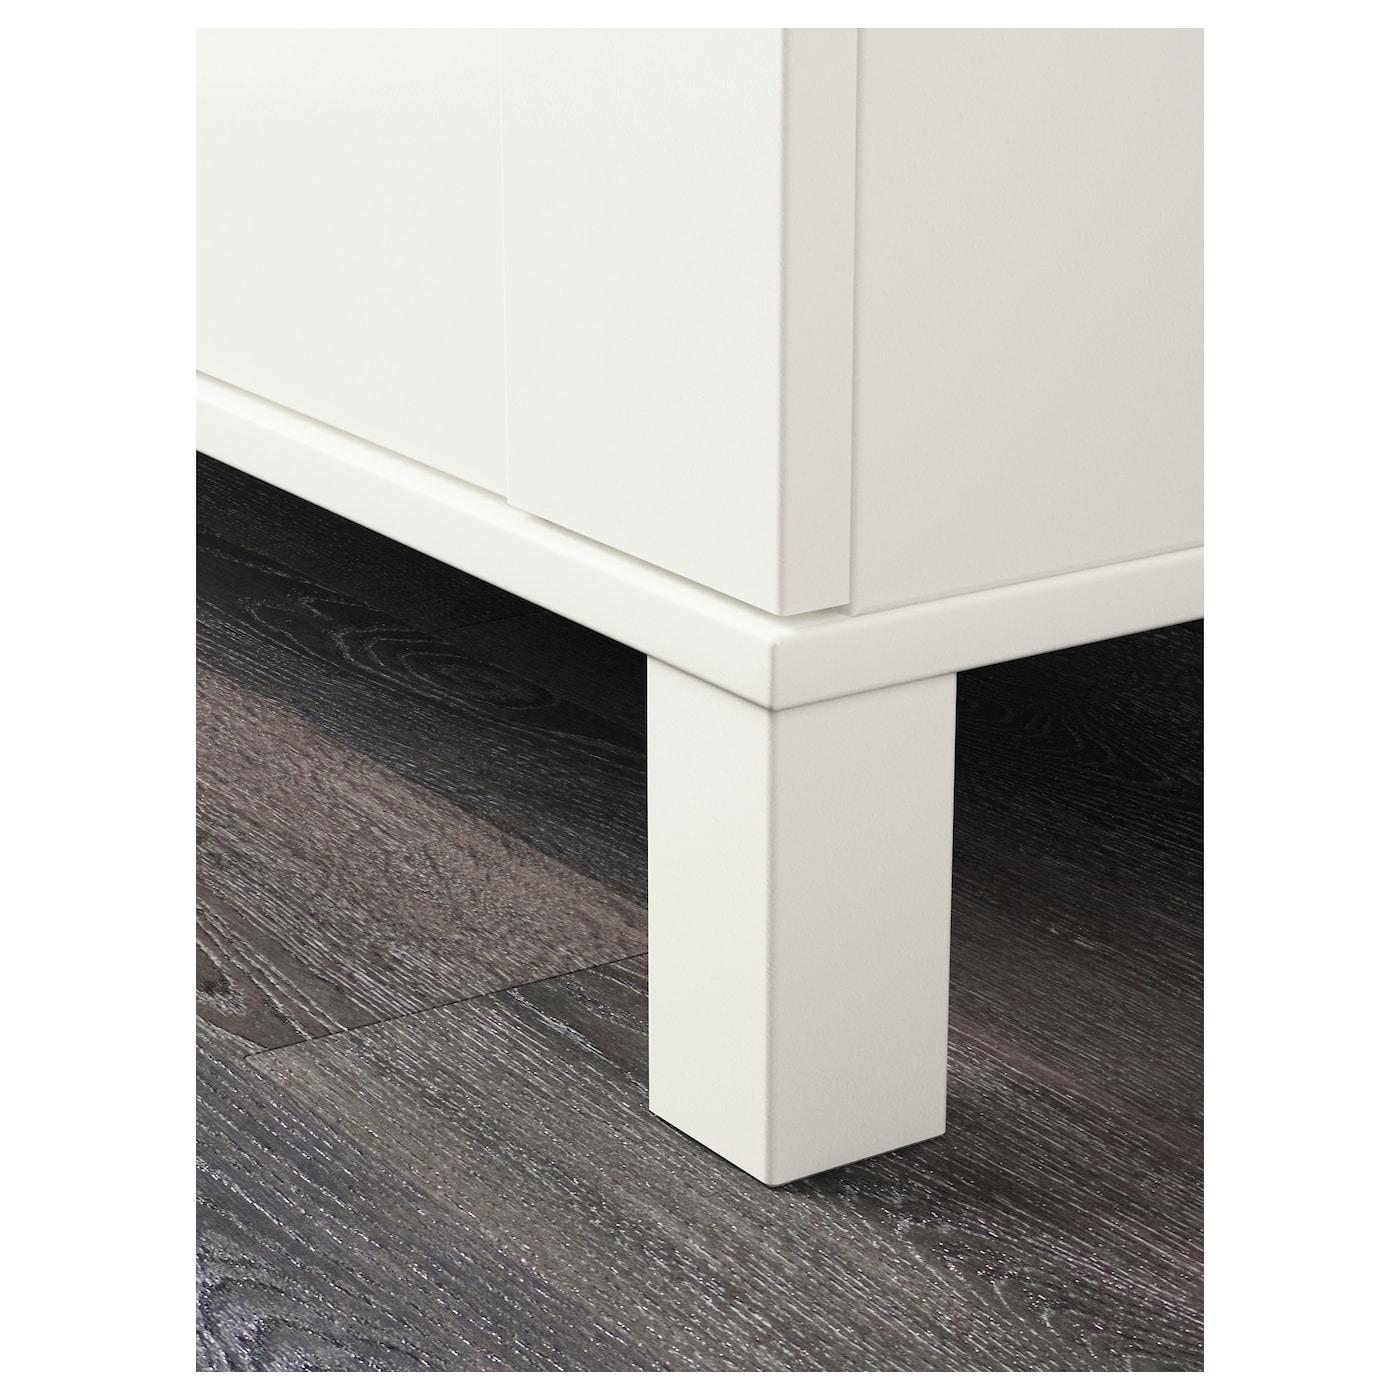 ANEBODA Wardrobe White 81x180 cm - IKEA